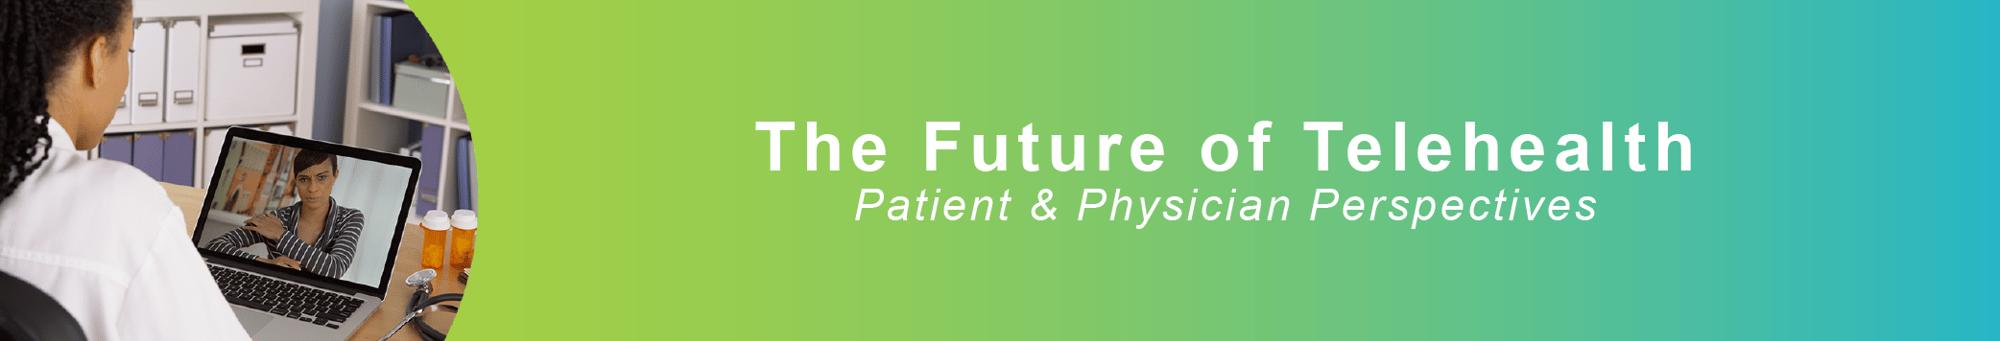 future of telehealth